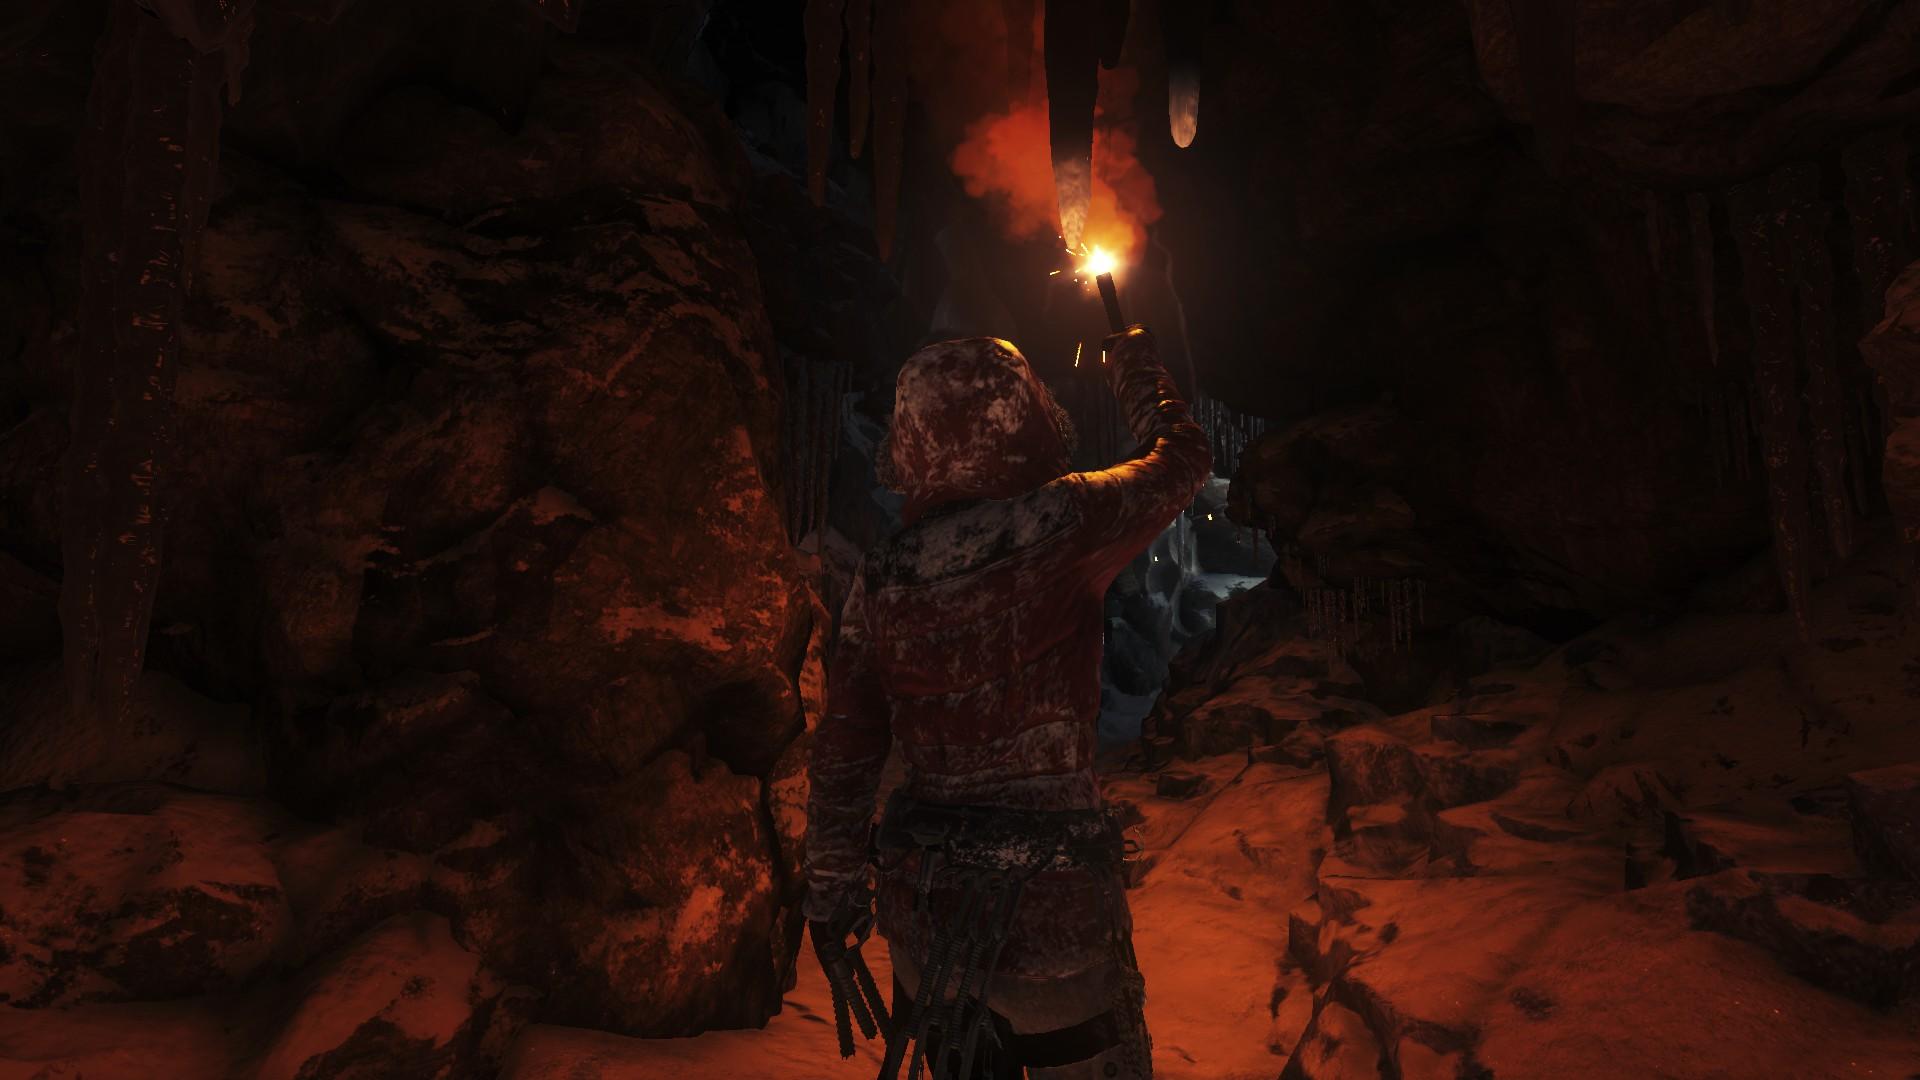 20171203195010_1.jpg - Rise of the Tomb Raider